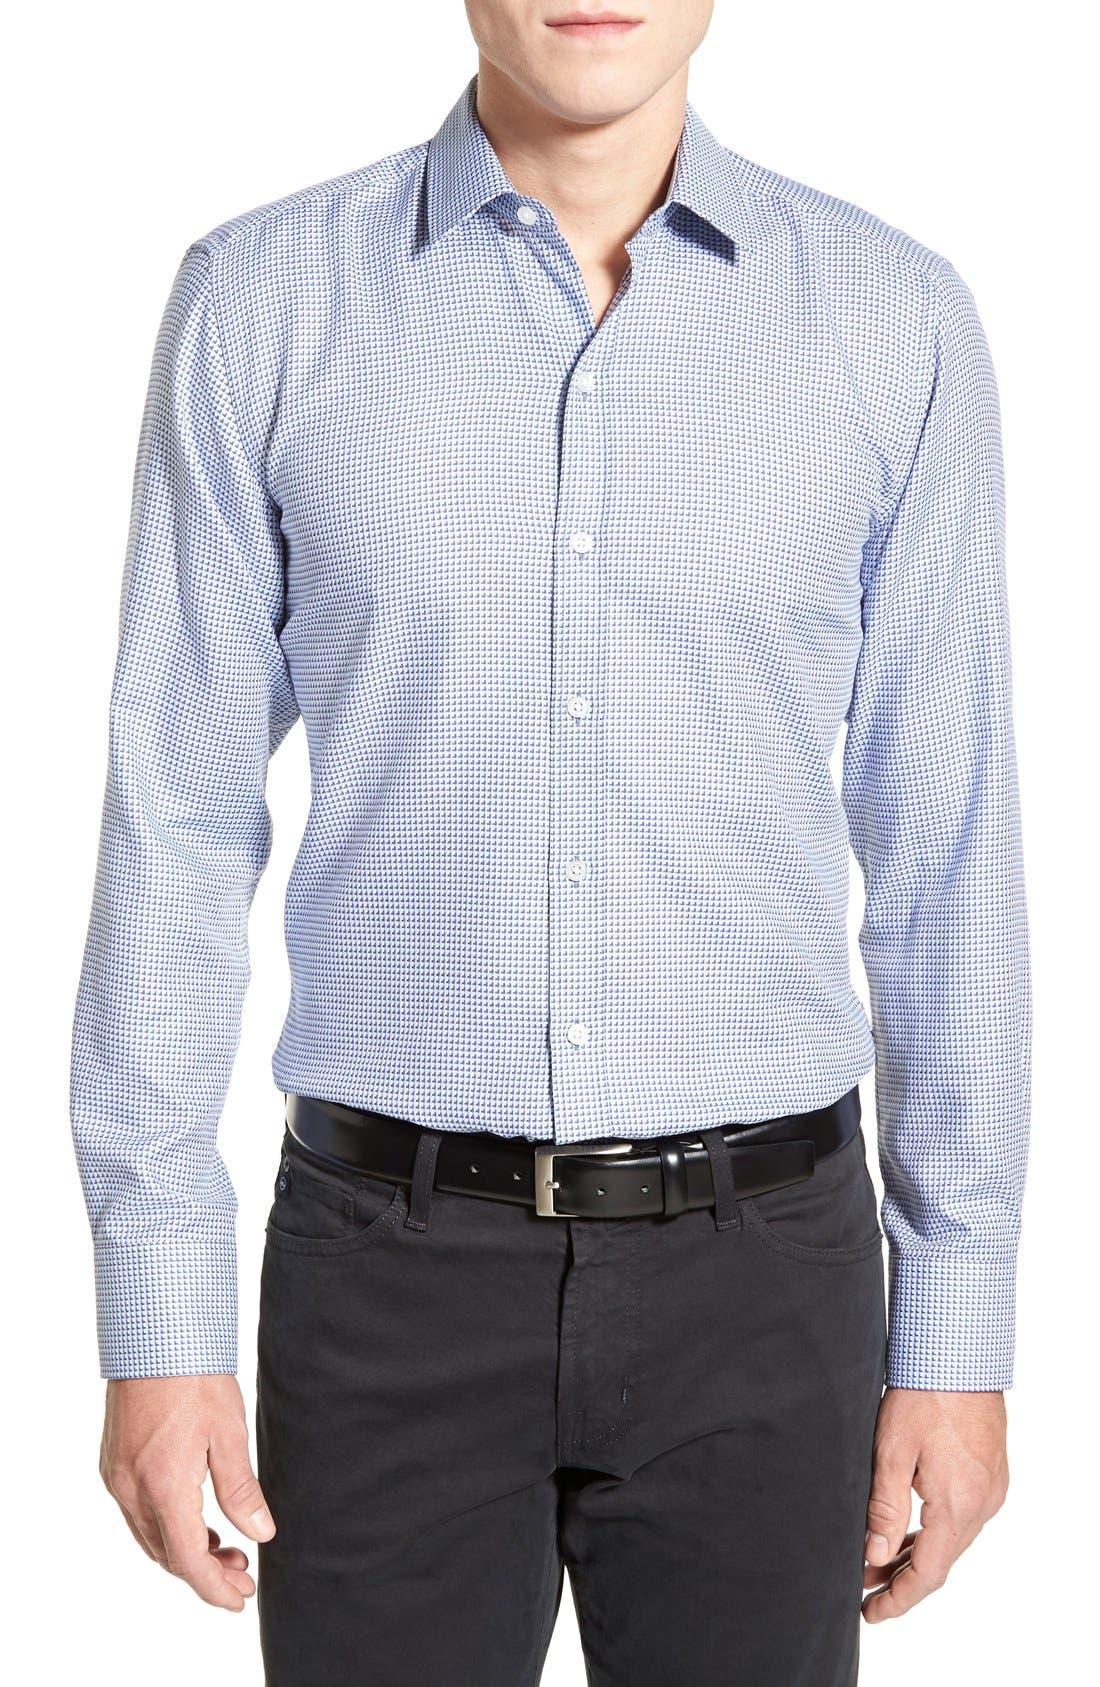 'Robbie' Slim Fit Sport Shirt,                             Main thumbnail 1, color,                             Turquoise